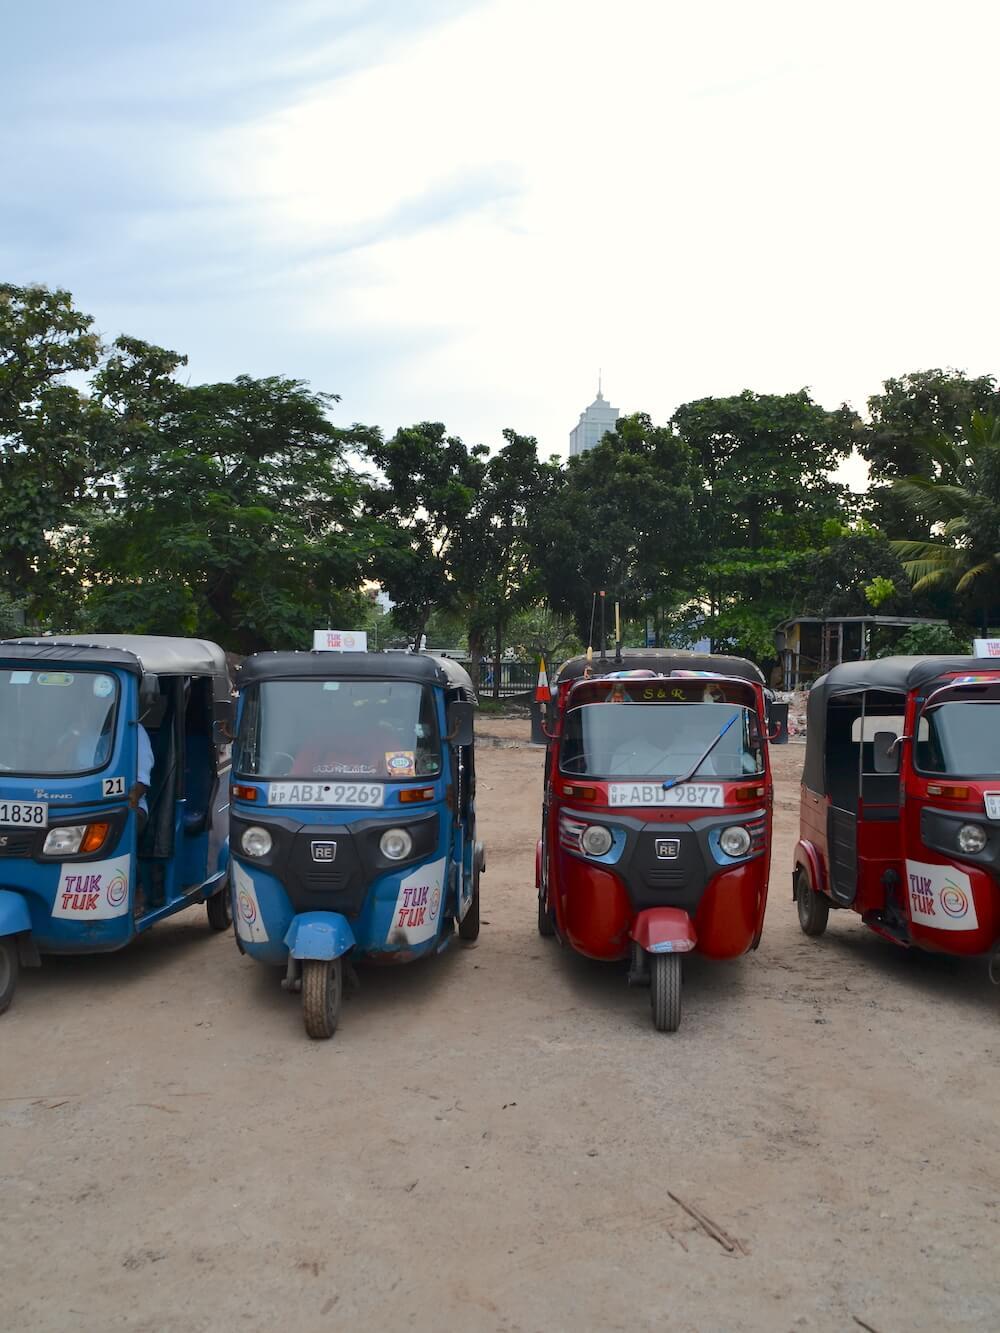 Wat te doen in Sri Lanka: tuktuks